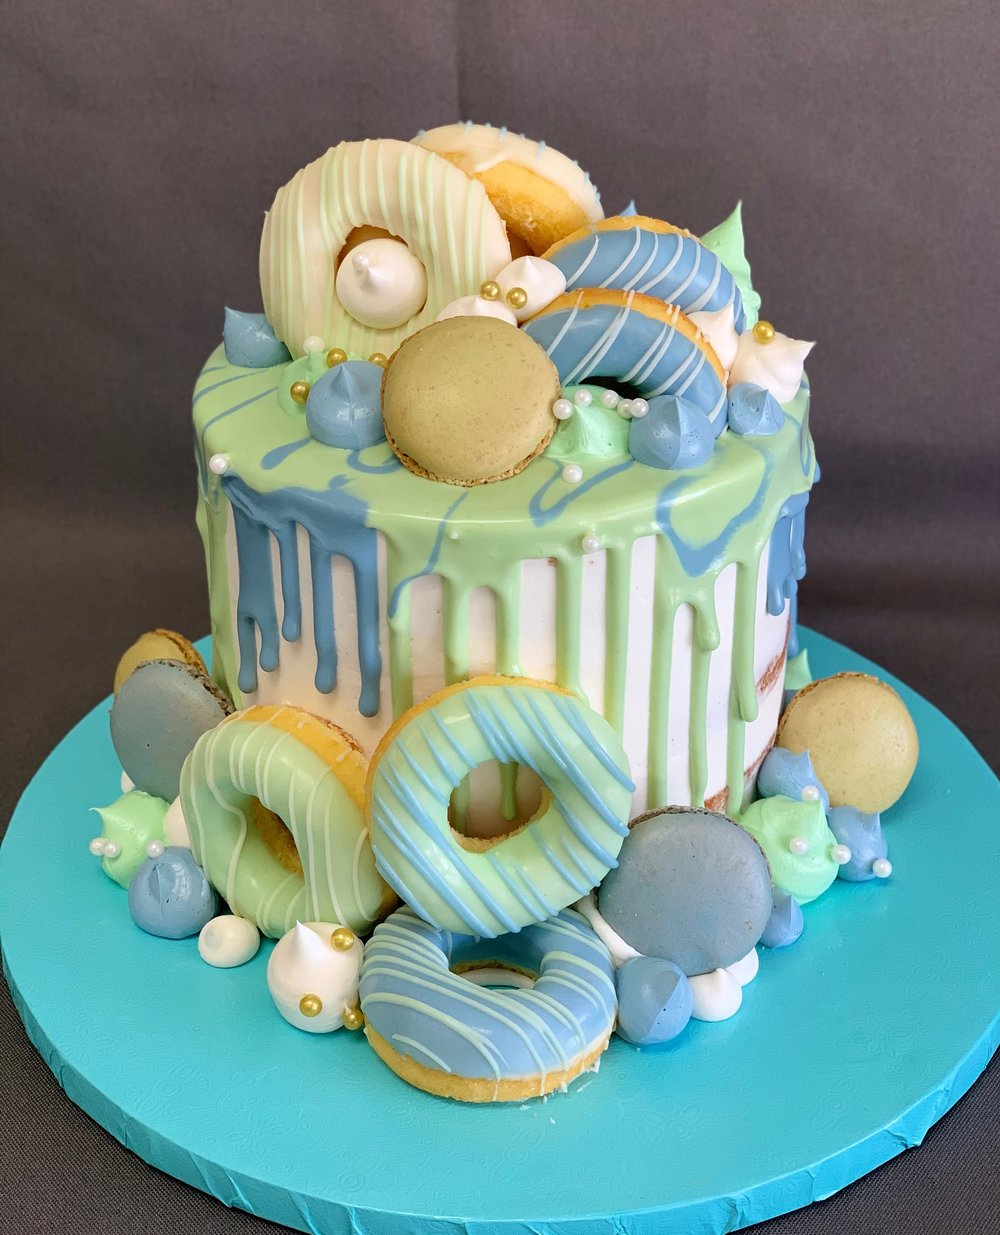 Donut Smash Cake NJ